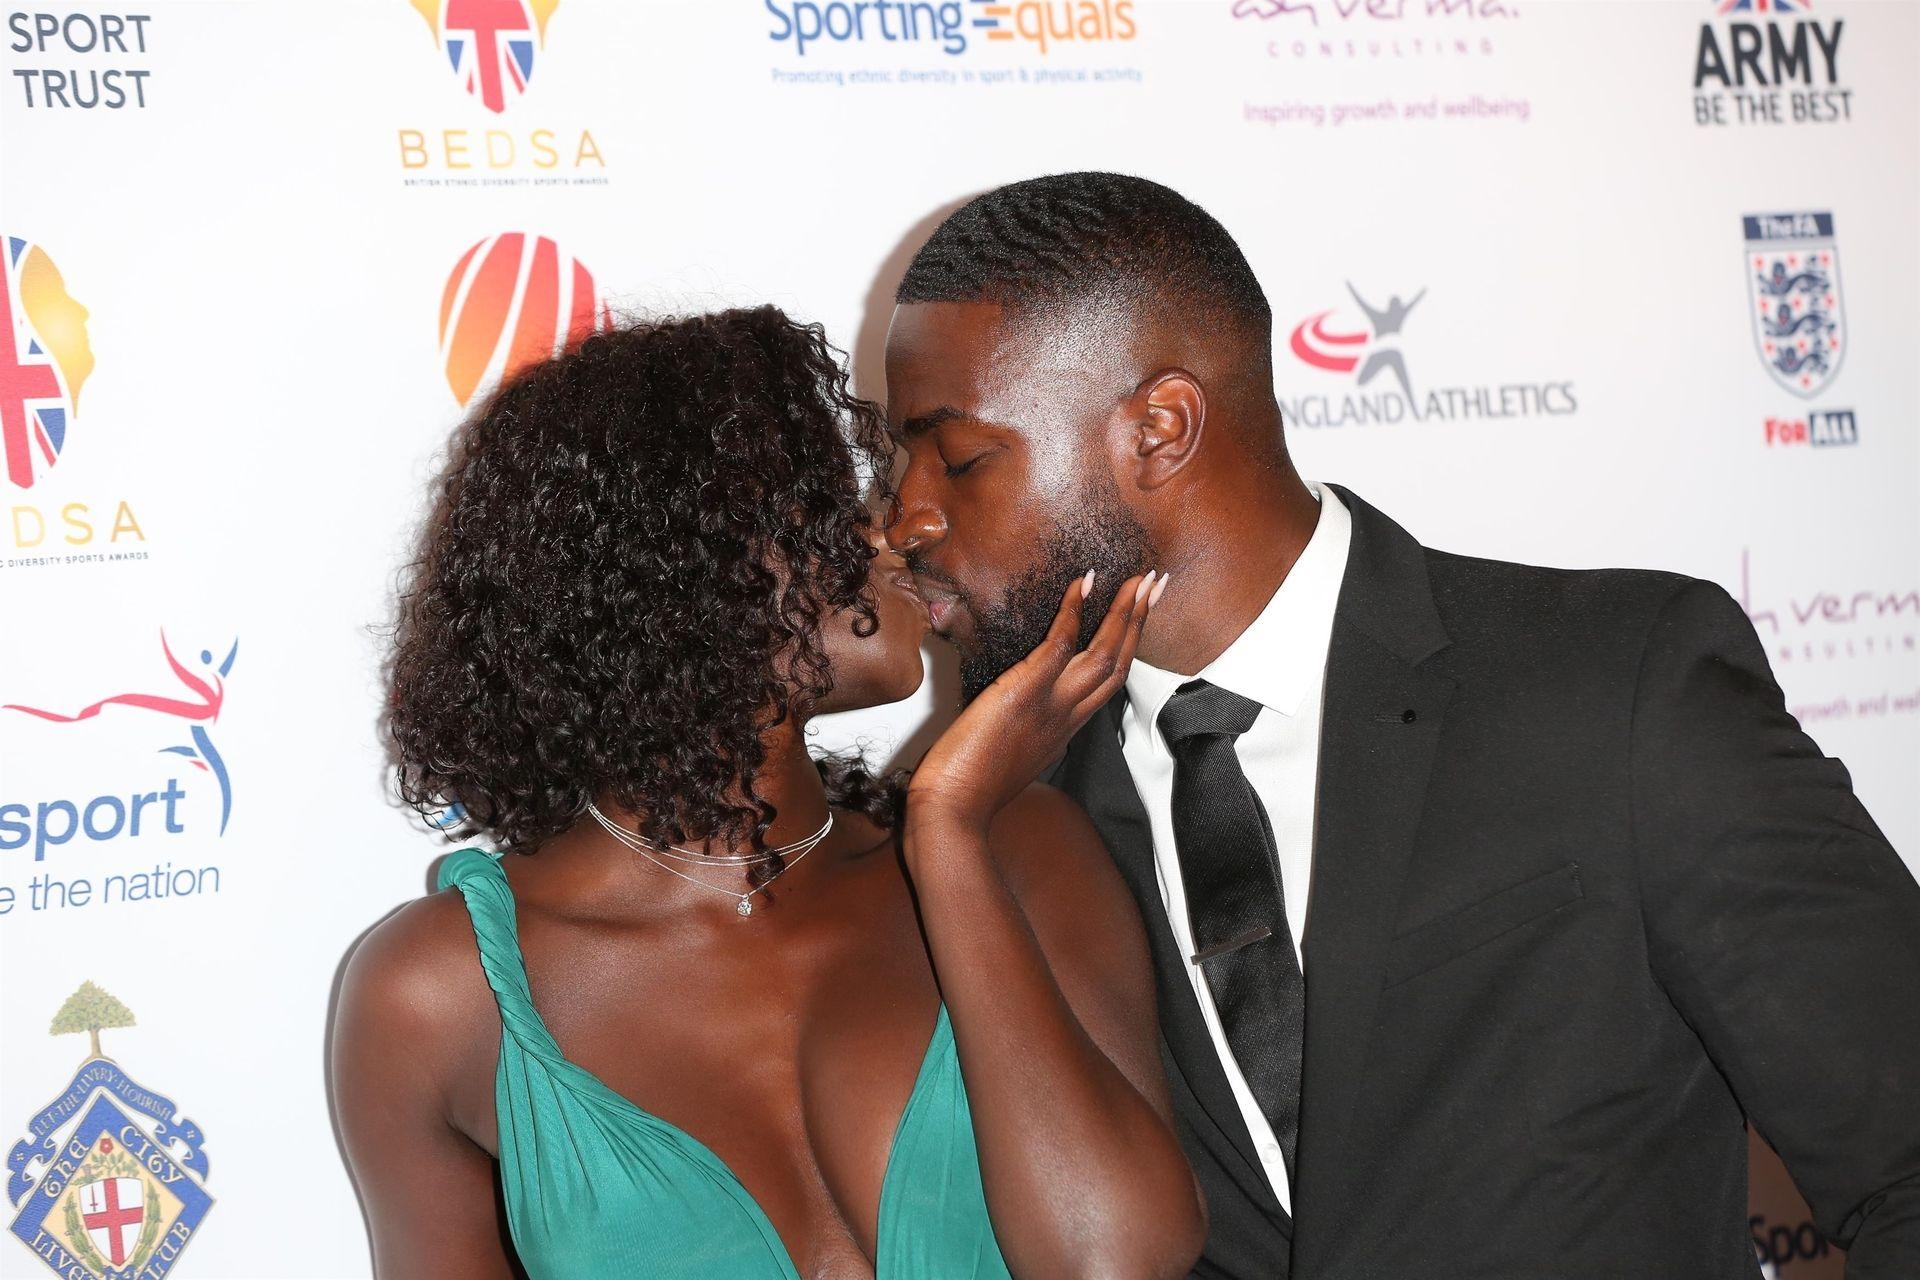 Mike Boateng & Priscilla Anyabu Are Seen At British Ethnic Diversity Sports Awards 0068